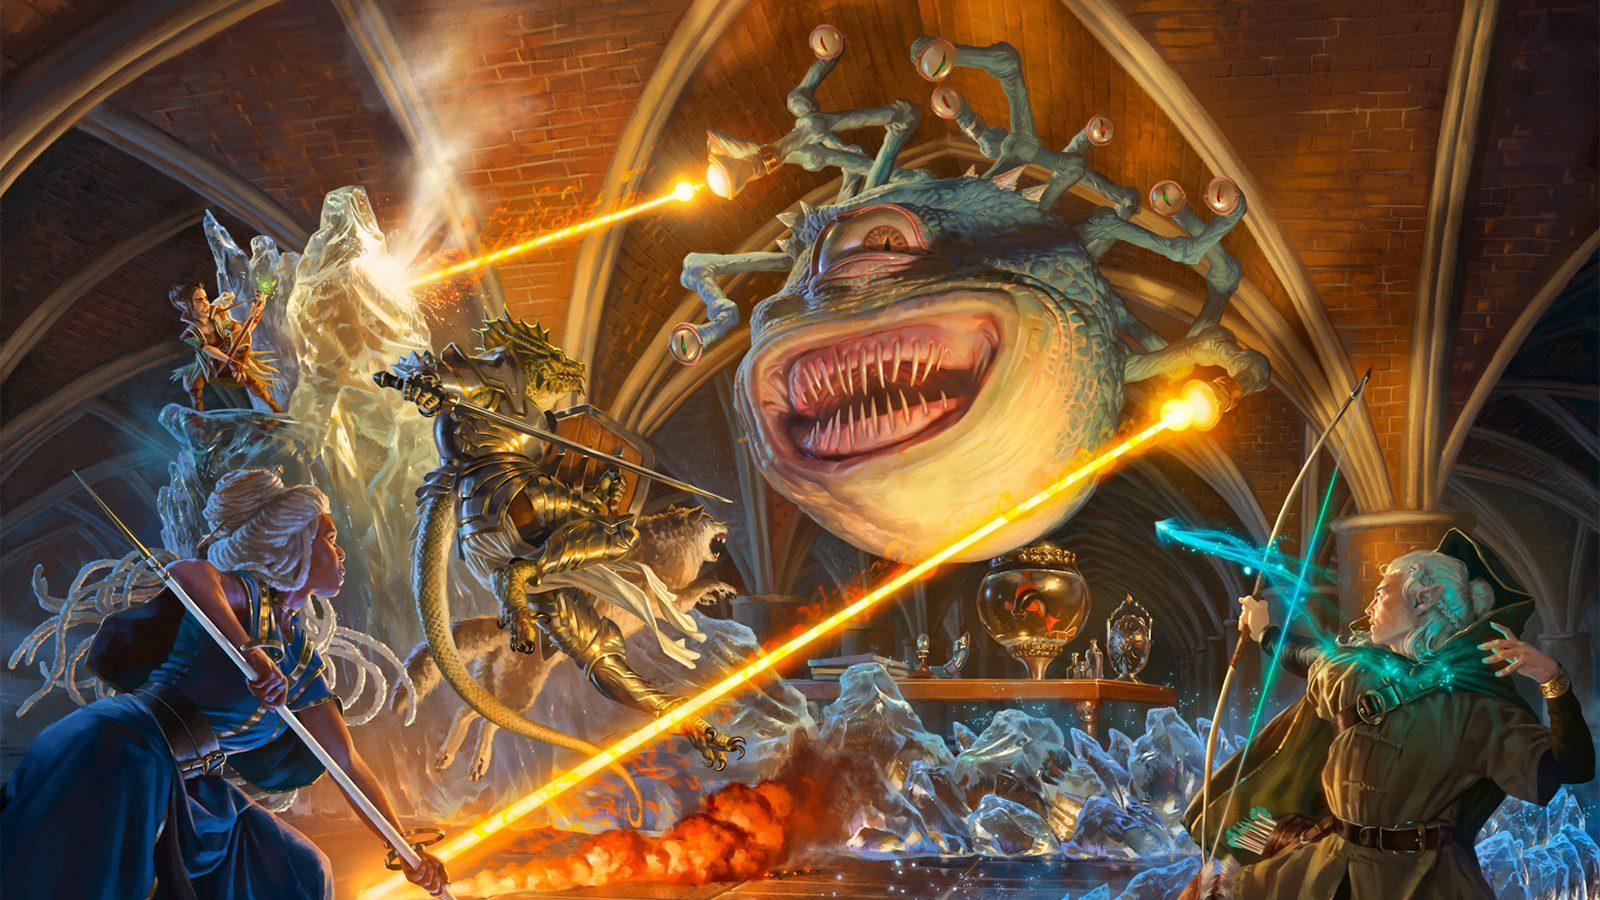 Adventures in the Forgotten Realms Beholder wallpaper